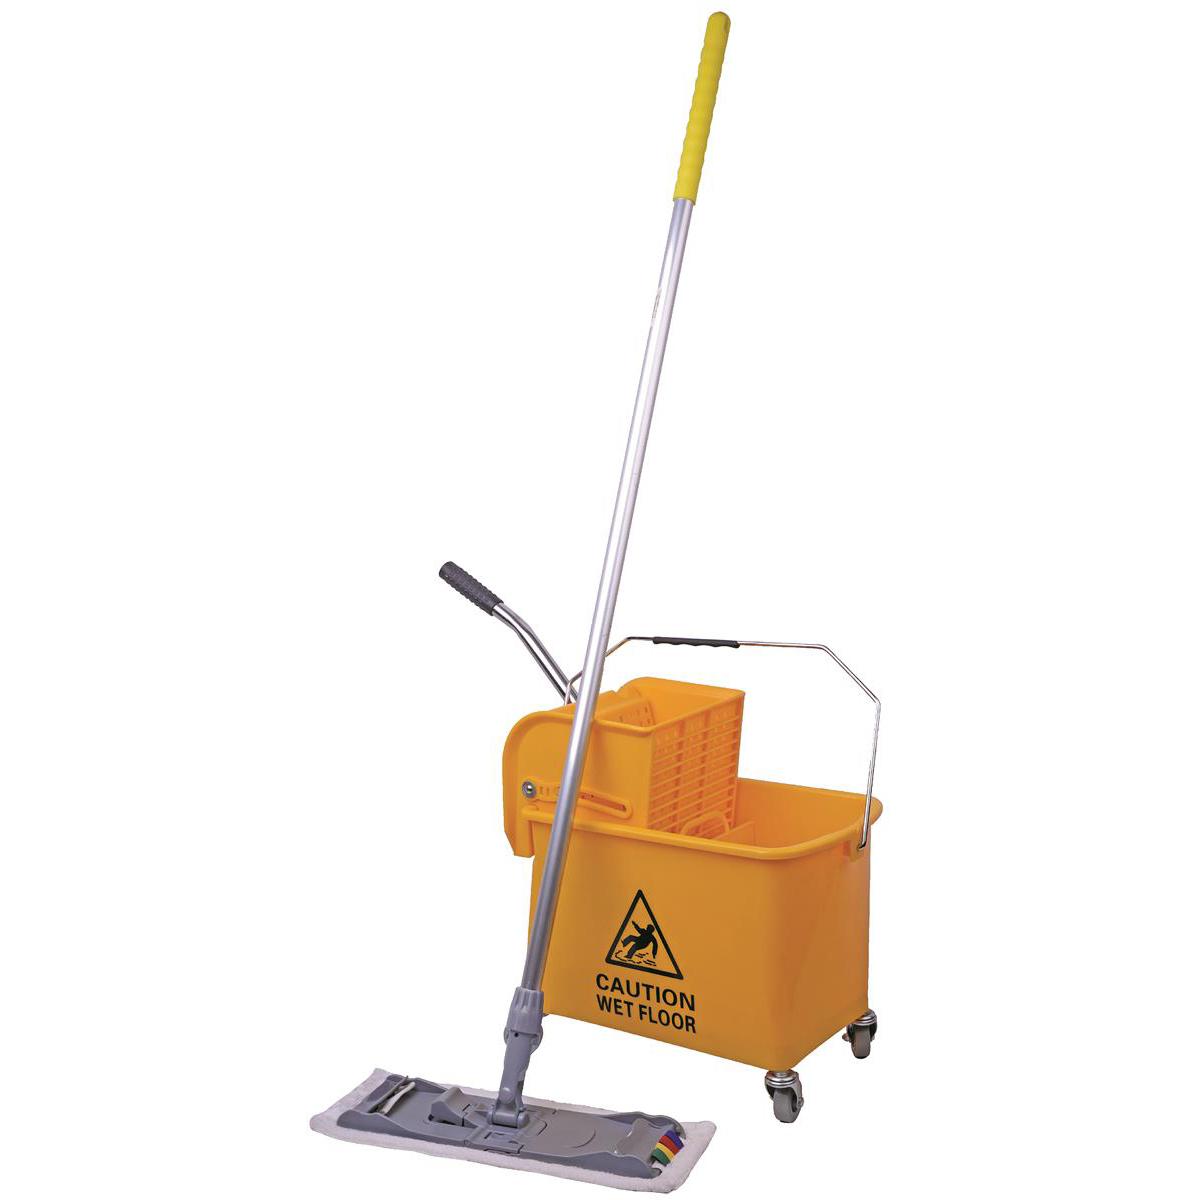 Robert Scott & Sons Microspeedy Mopping System Starter Kit Yellow Ref 101284 - Yellow KIT